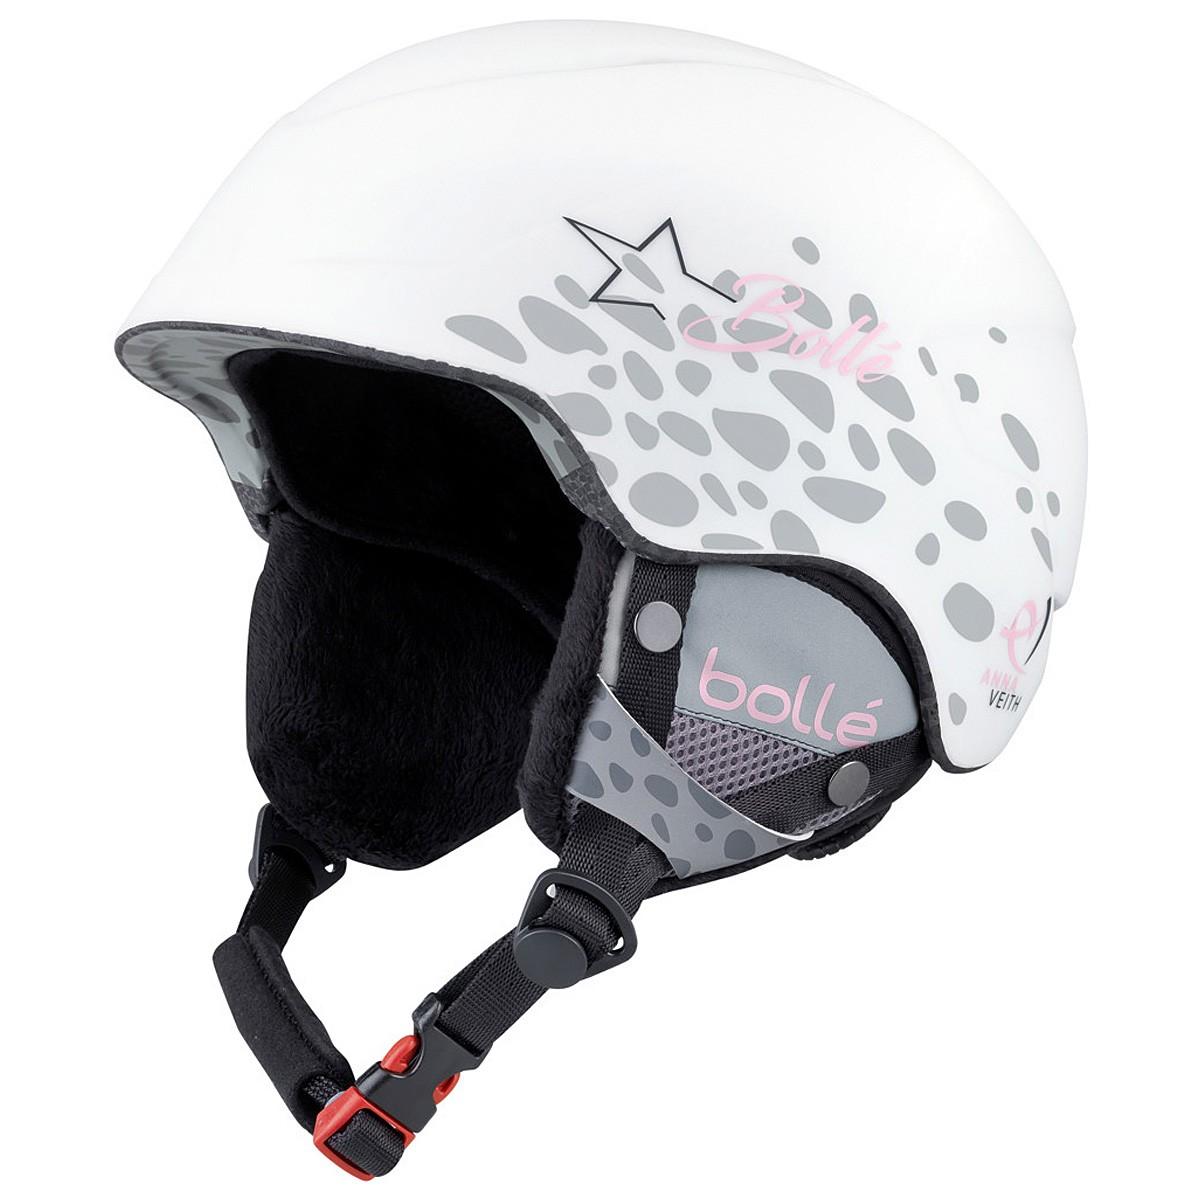 casque ski bolle b lieve casques ski et snowboard. Black Bedroom Furniture Sets. Home Design Ideas